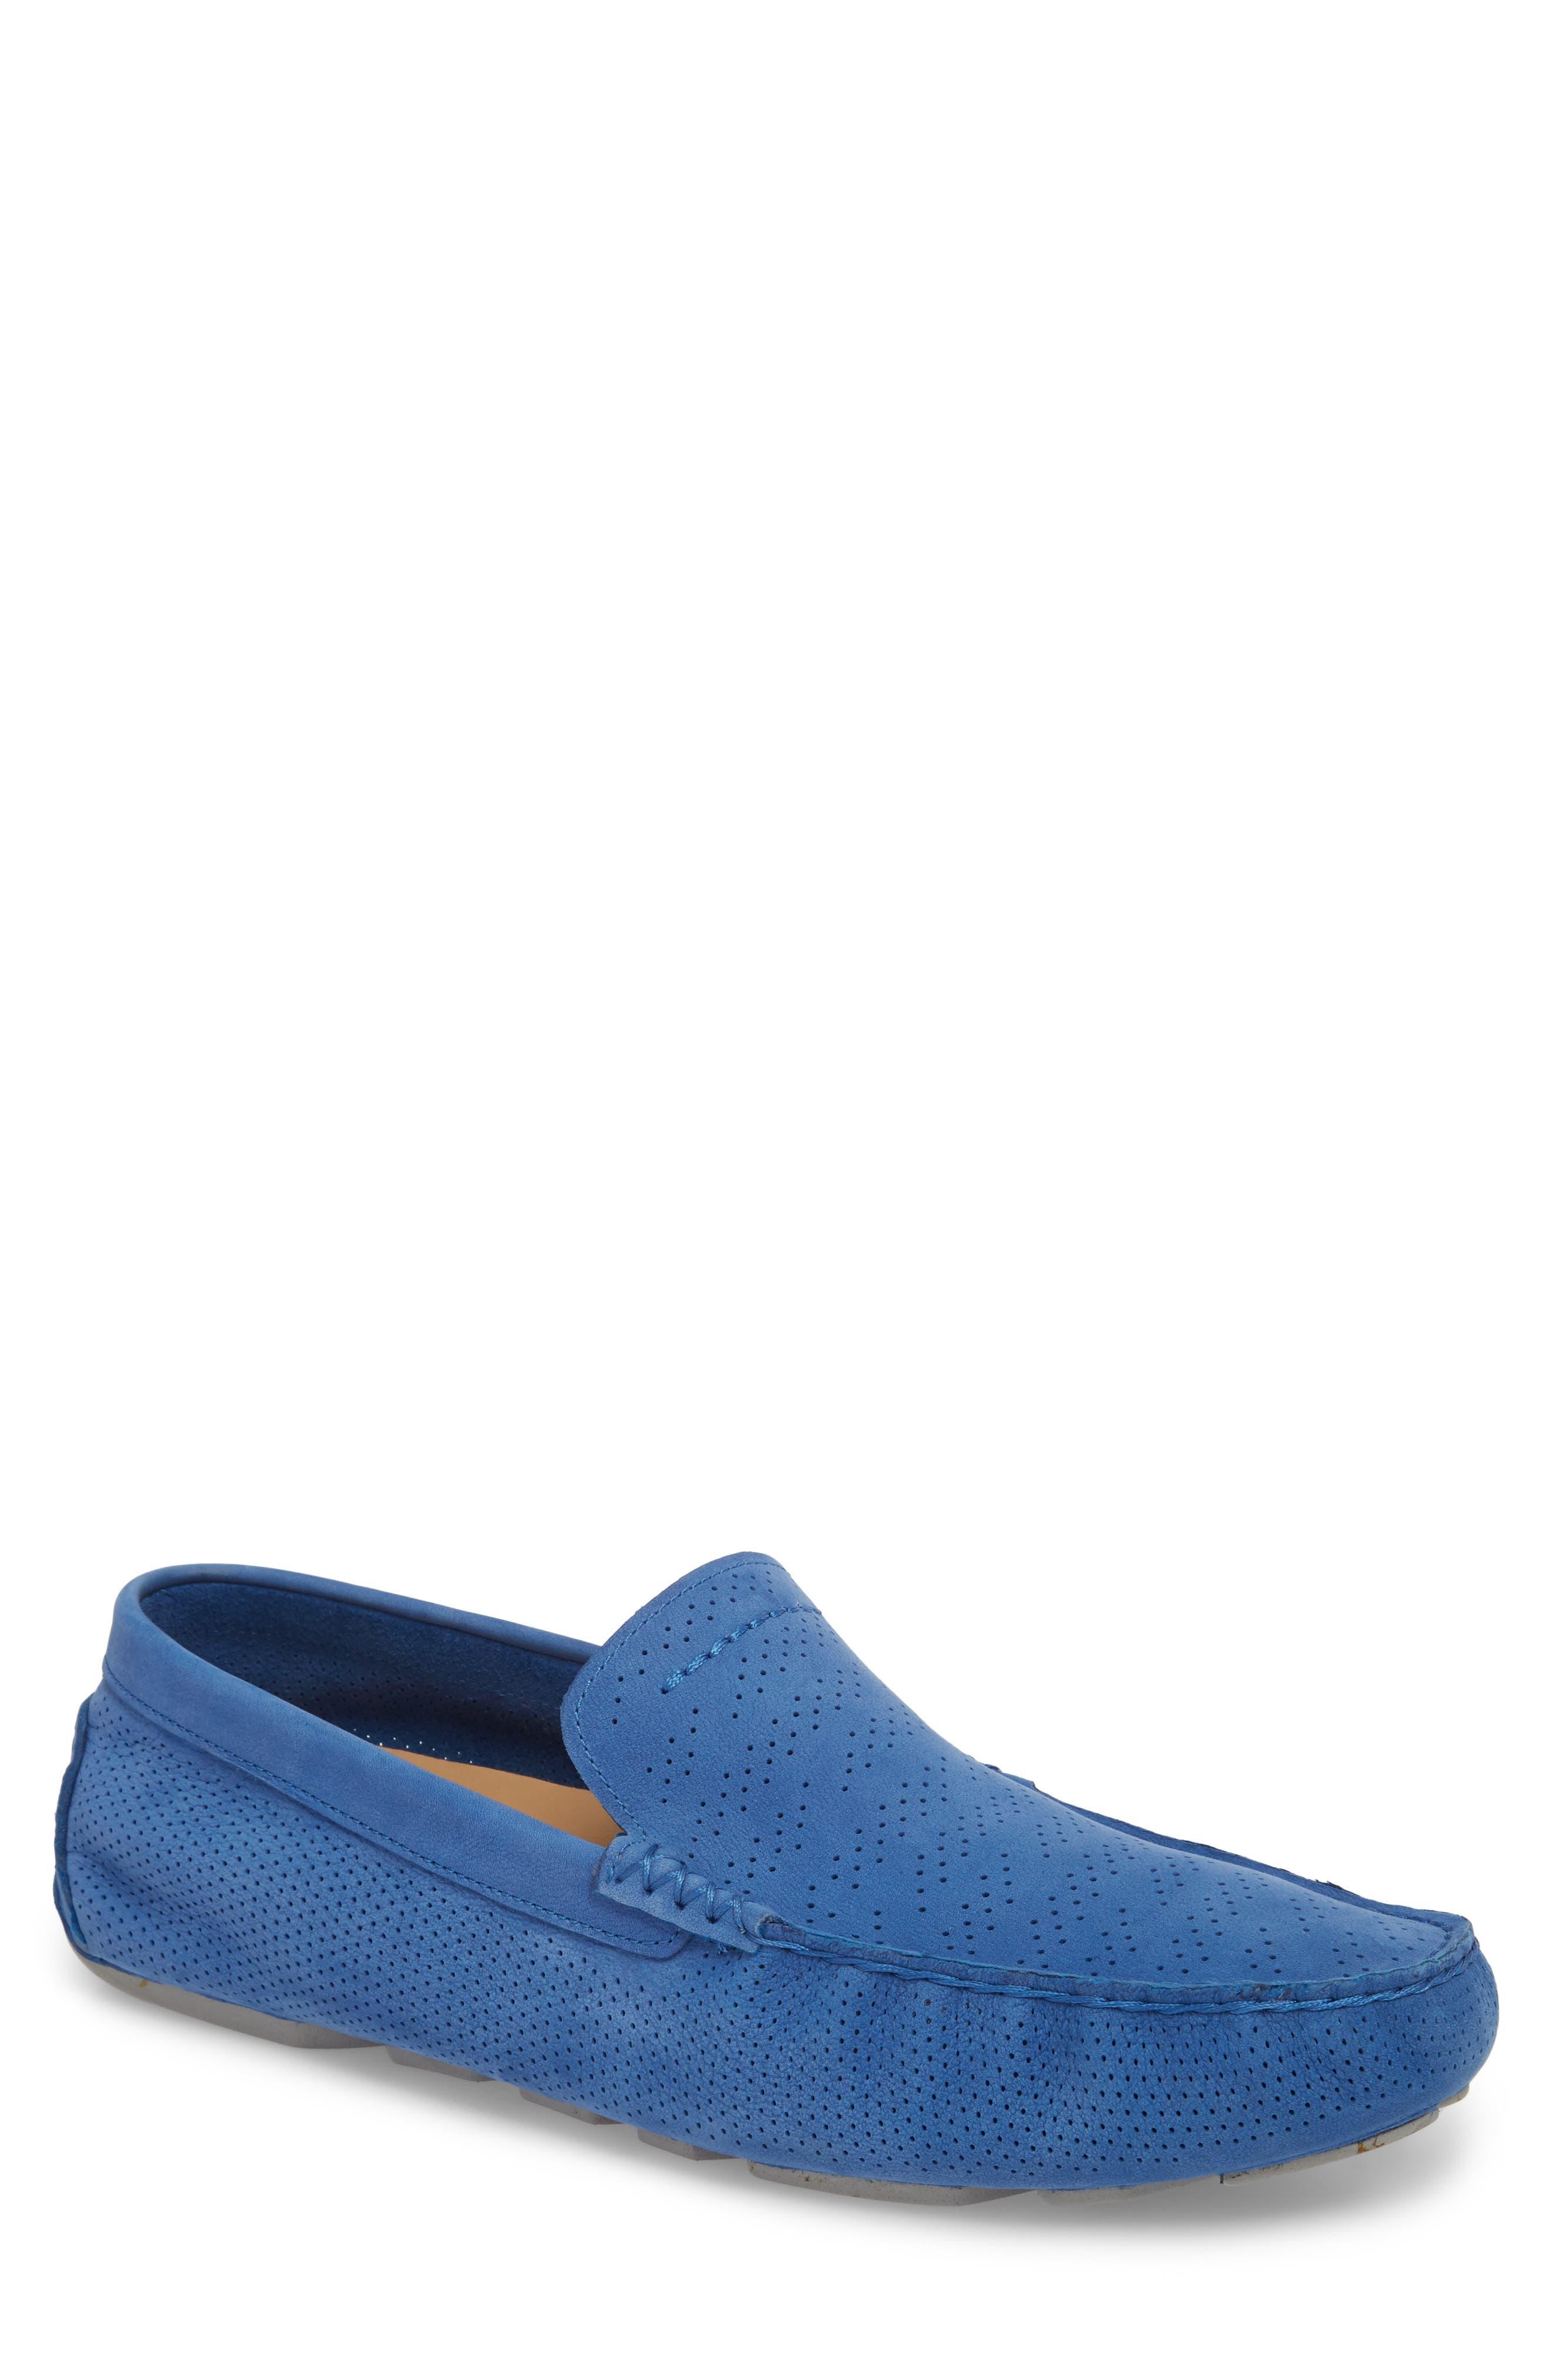 Alternate Image 1 Selected - UGG® Henrick Twinsole® Driving Shoe (Men)